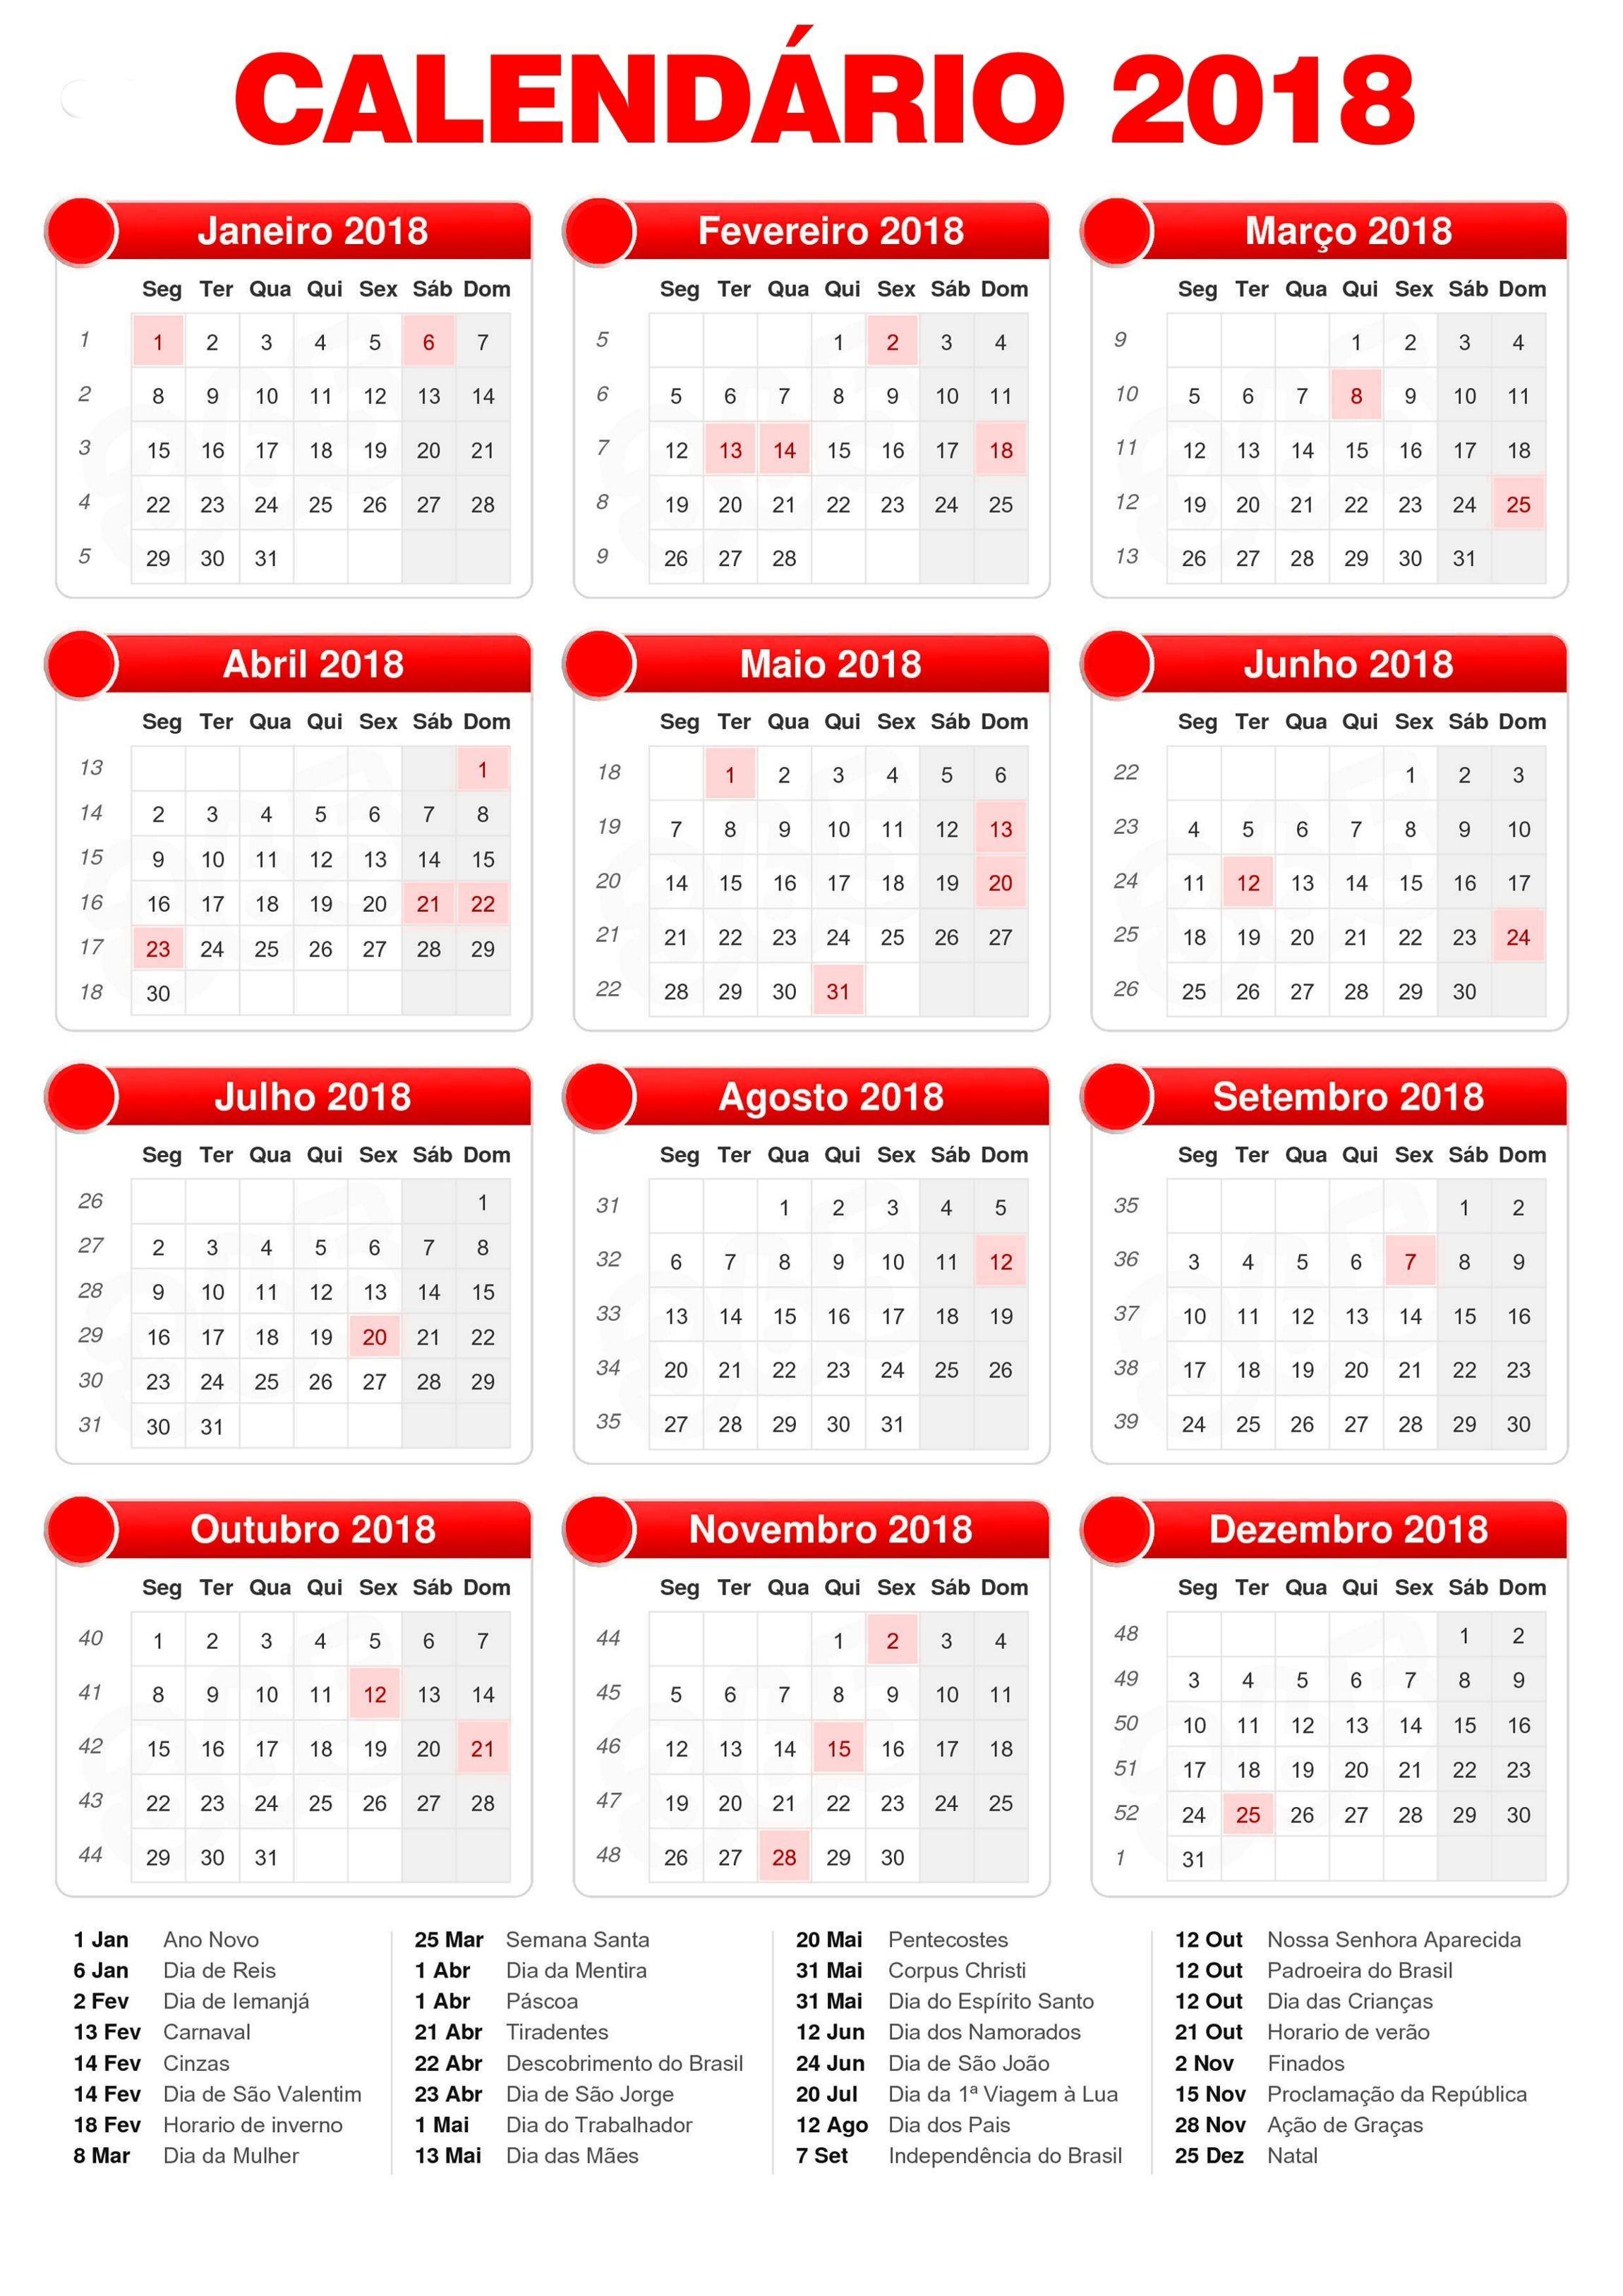 calendario 2018 feriados 2018 2018 2019 Calendƒ¡rio 2018